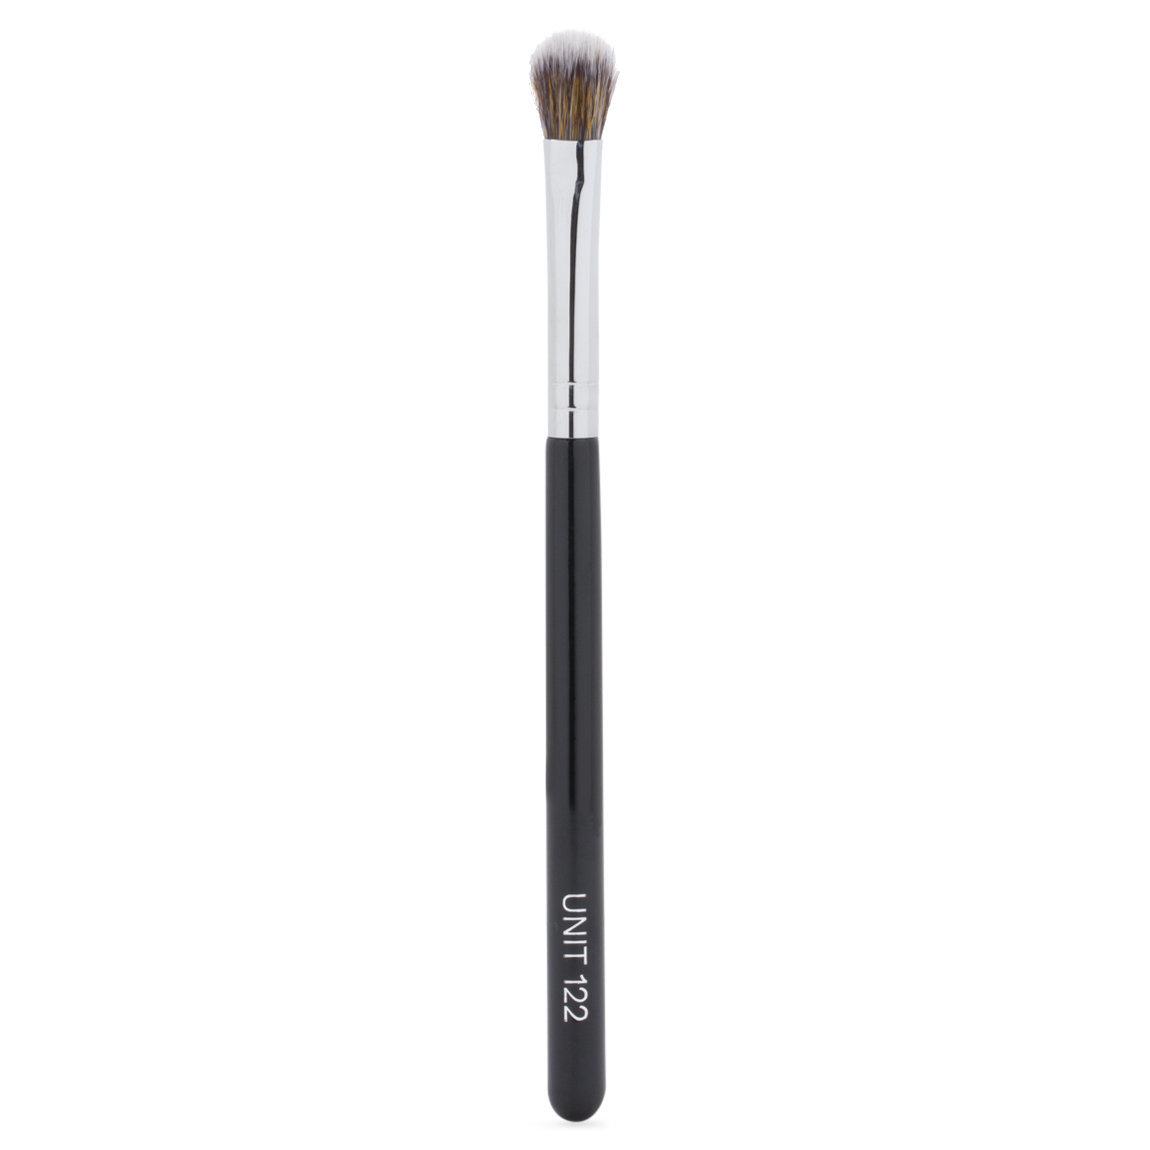 UNITS UNIT 122 Eye Brush alternative view 1 - product swatch.